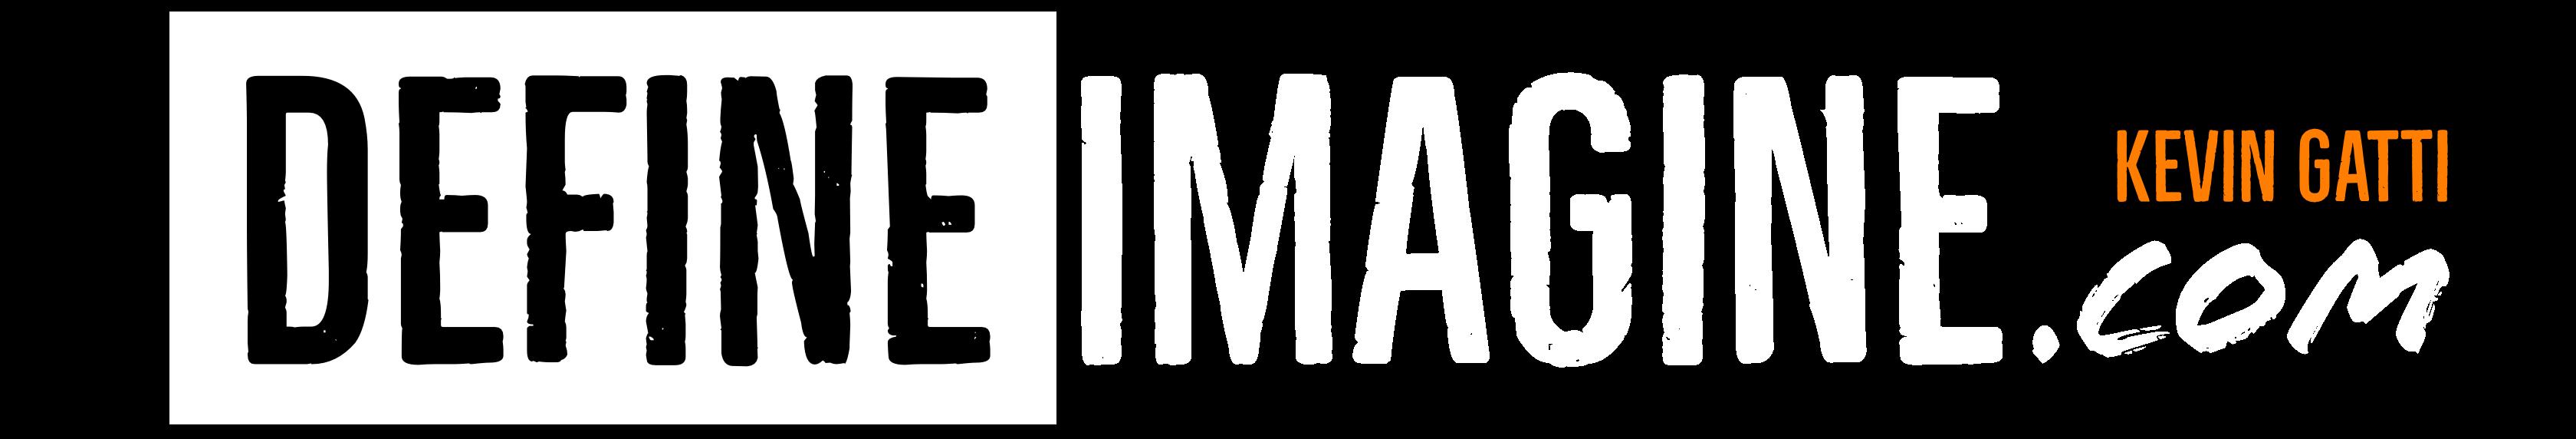 DefineImagine.com